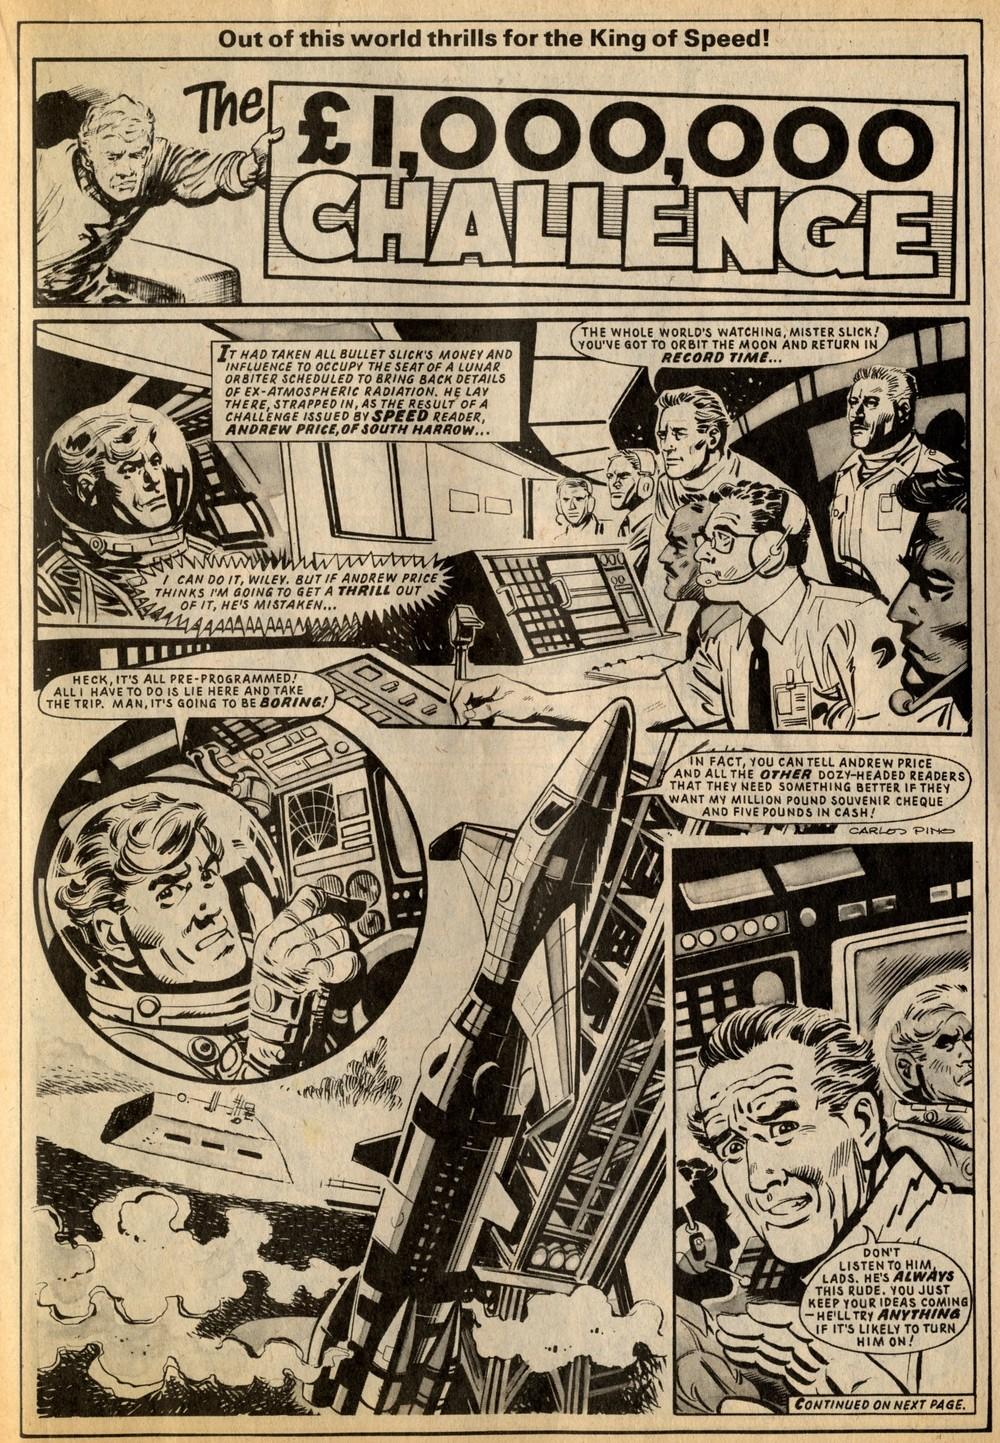 The £1,000,000 Challenge: Carlos Pino (artist)